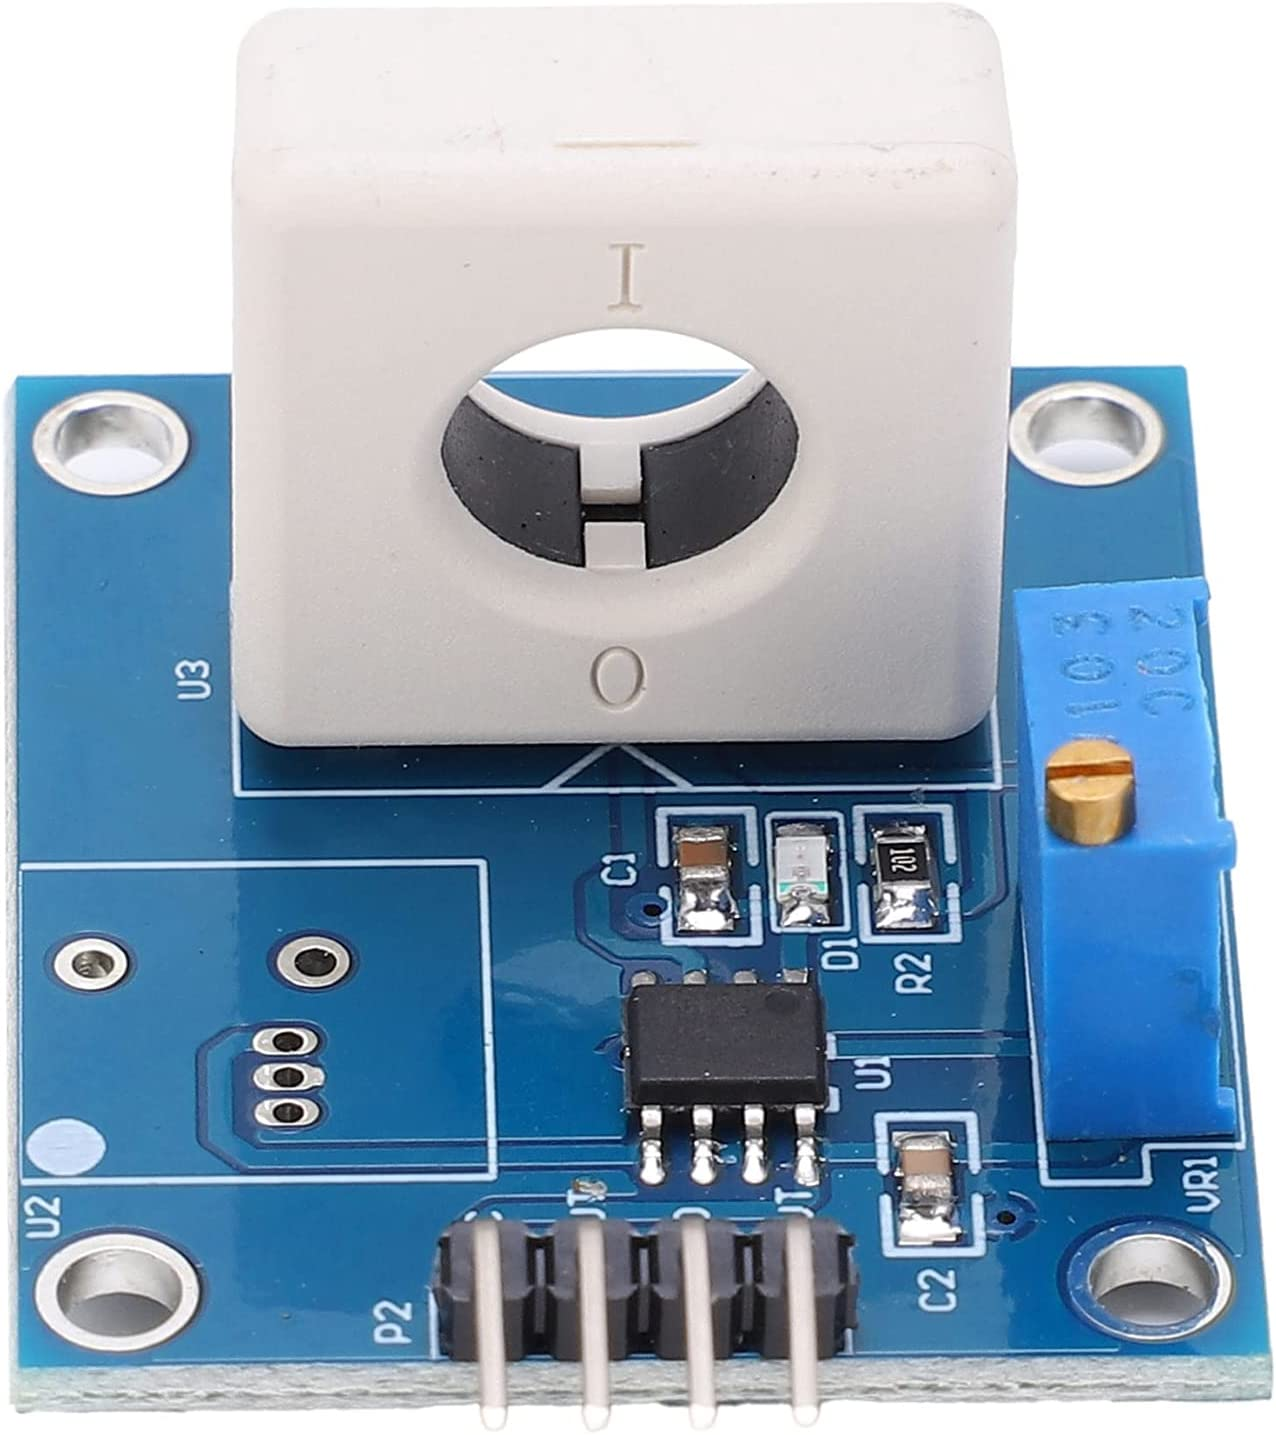 753 1Pcs Hall Effect Sensor Module Ind Range 35A 2021 model with Oklahoma City Mall LED